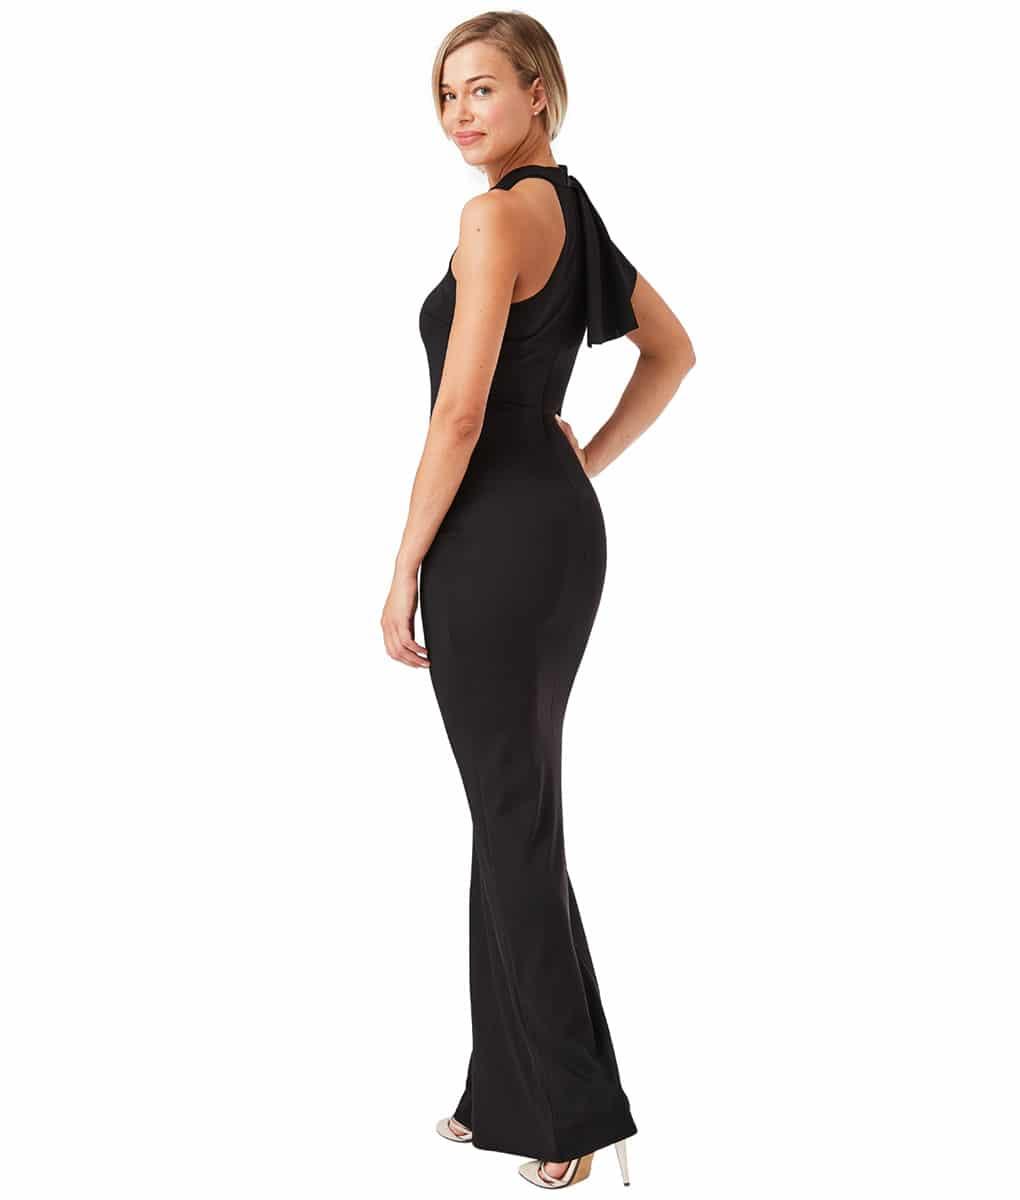 Alila-Black-Slinky-Gown-City-Goddess